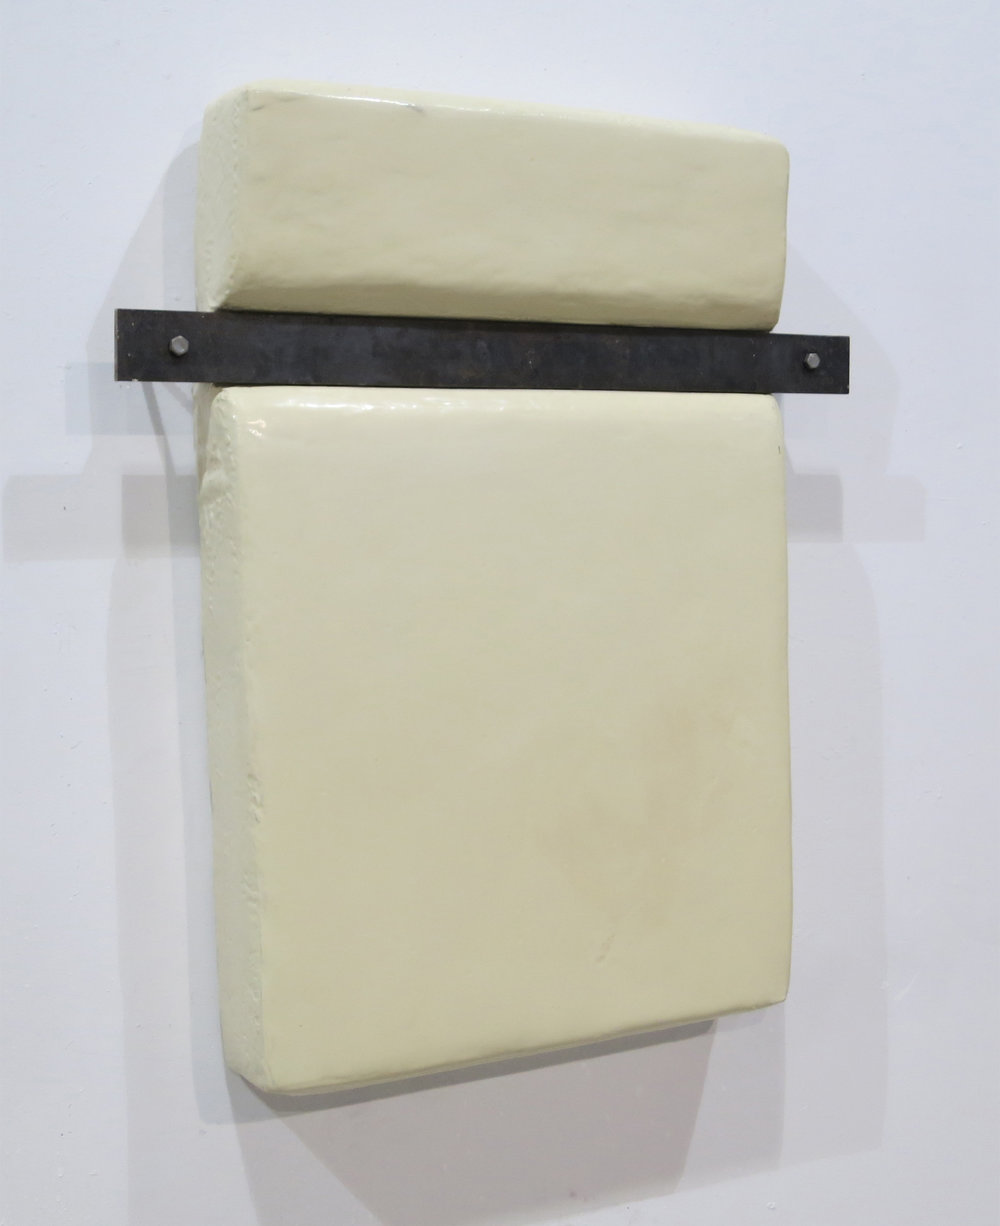 Copy of Gary Kuehn, Untitled, 1999